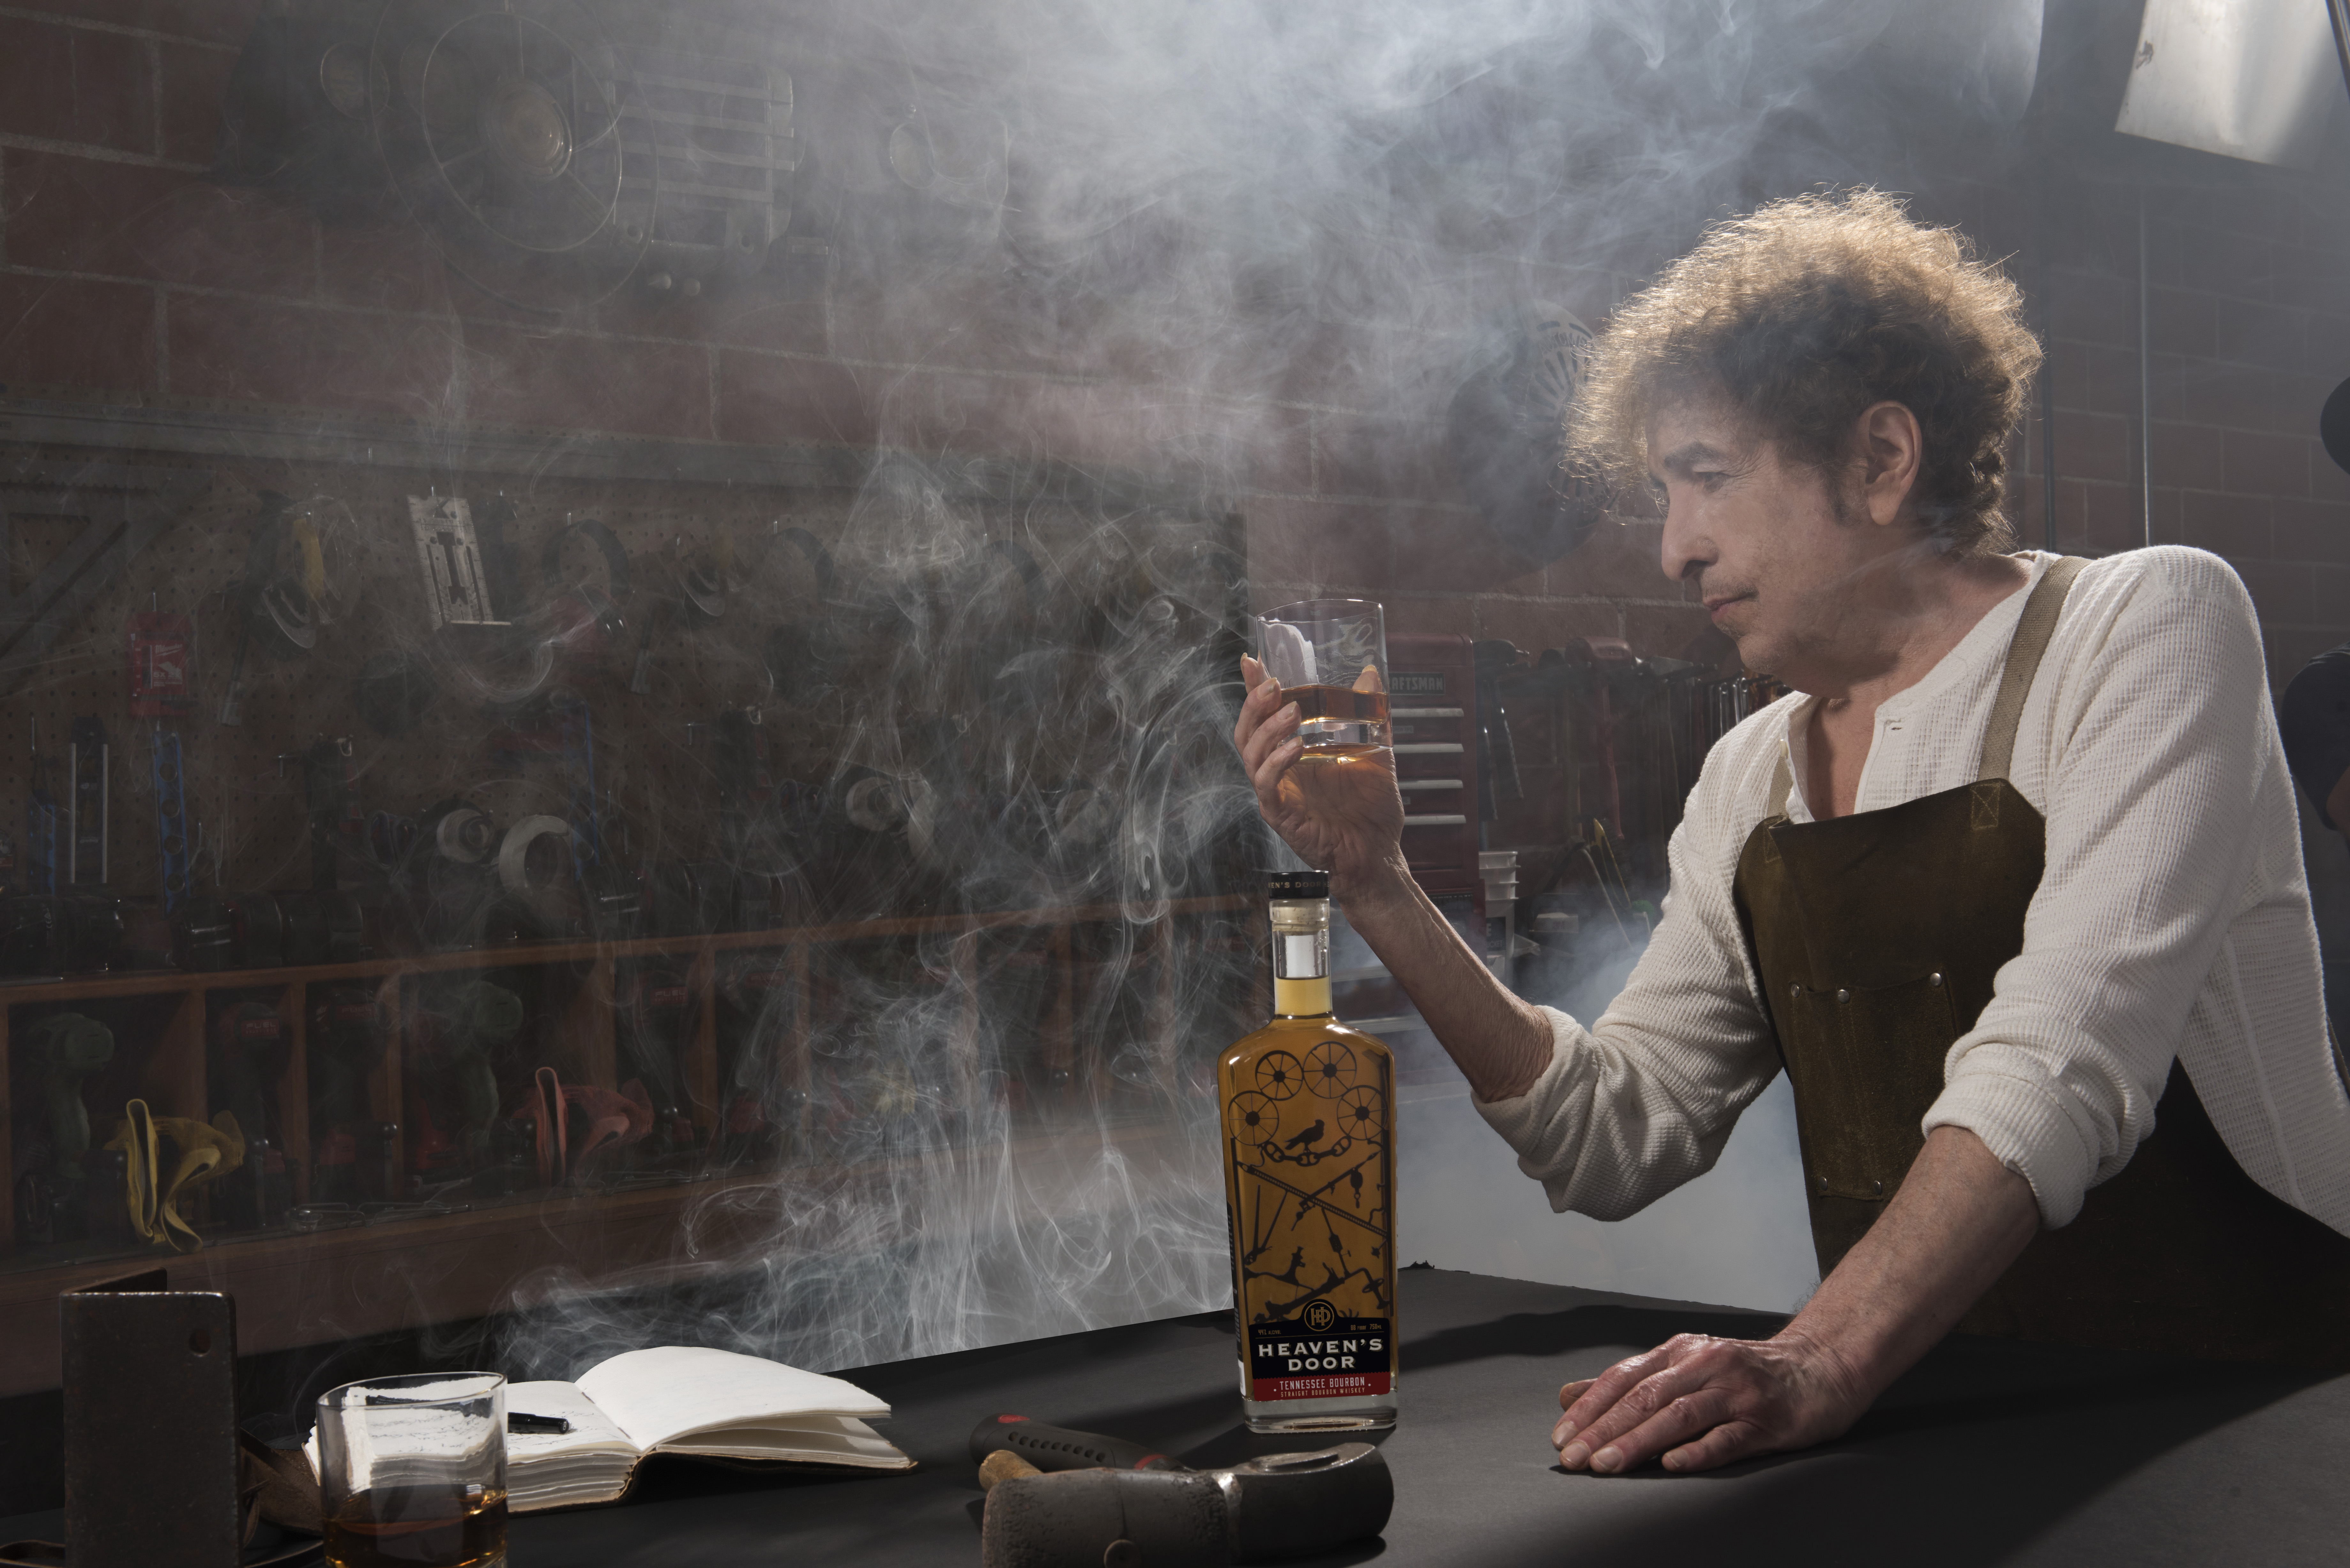 Bob Dylan Tour Dates 2020 Bob Dylan's Heaven's Door Whiskey Distillery to Open in Nashville